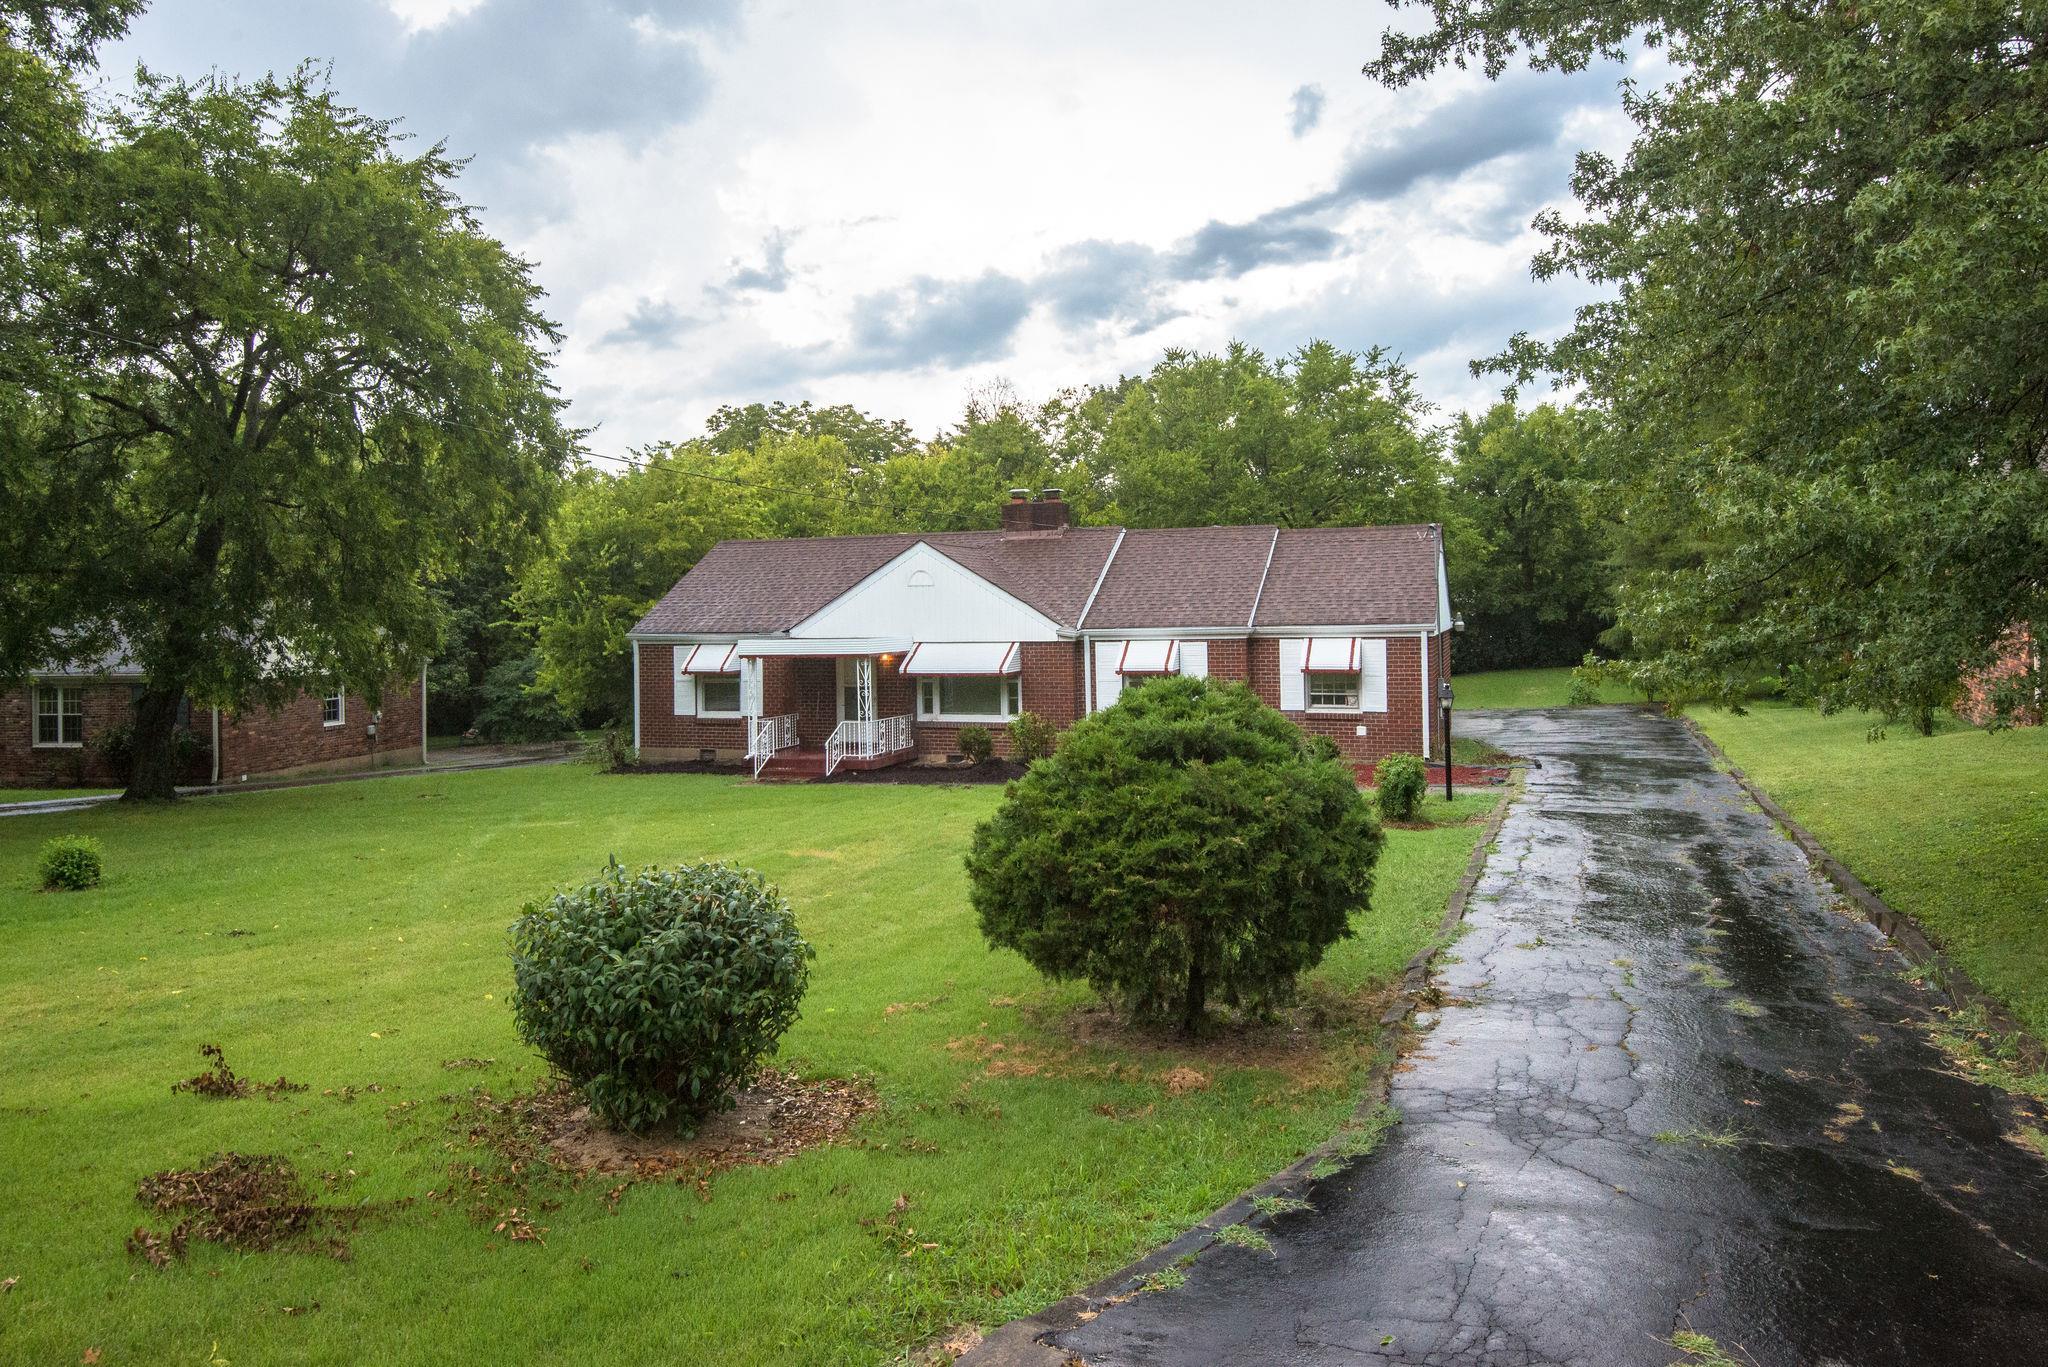 1205 Richmond Dr, Nashville, TN 37216 - Nashville, TN real estate listing